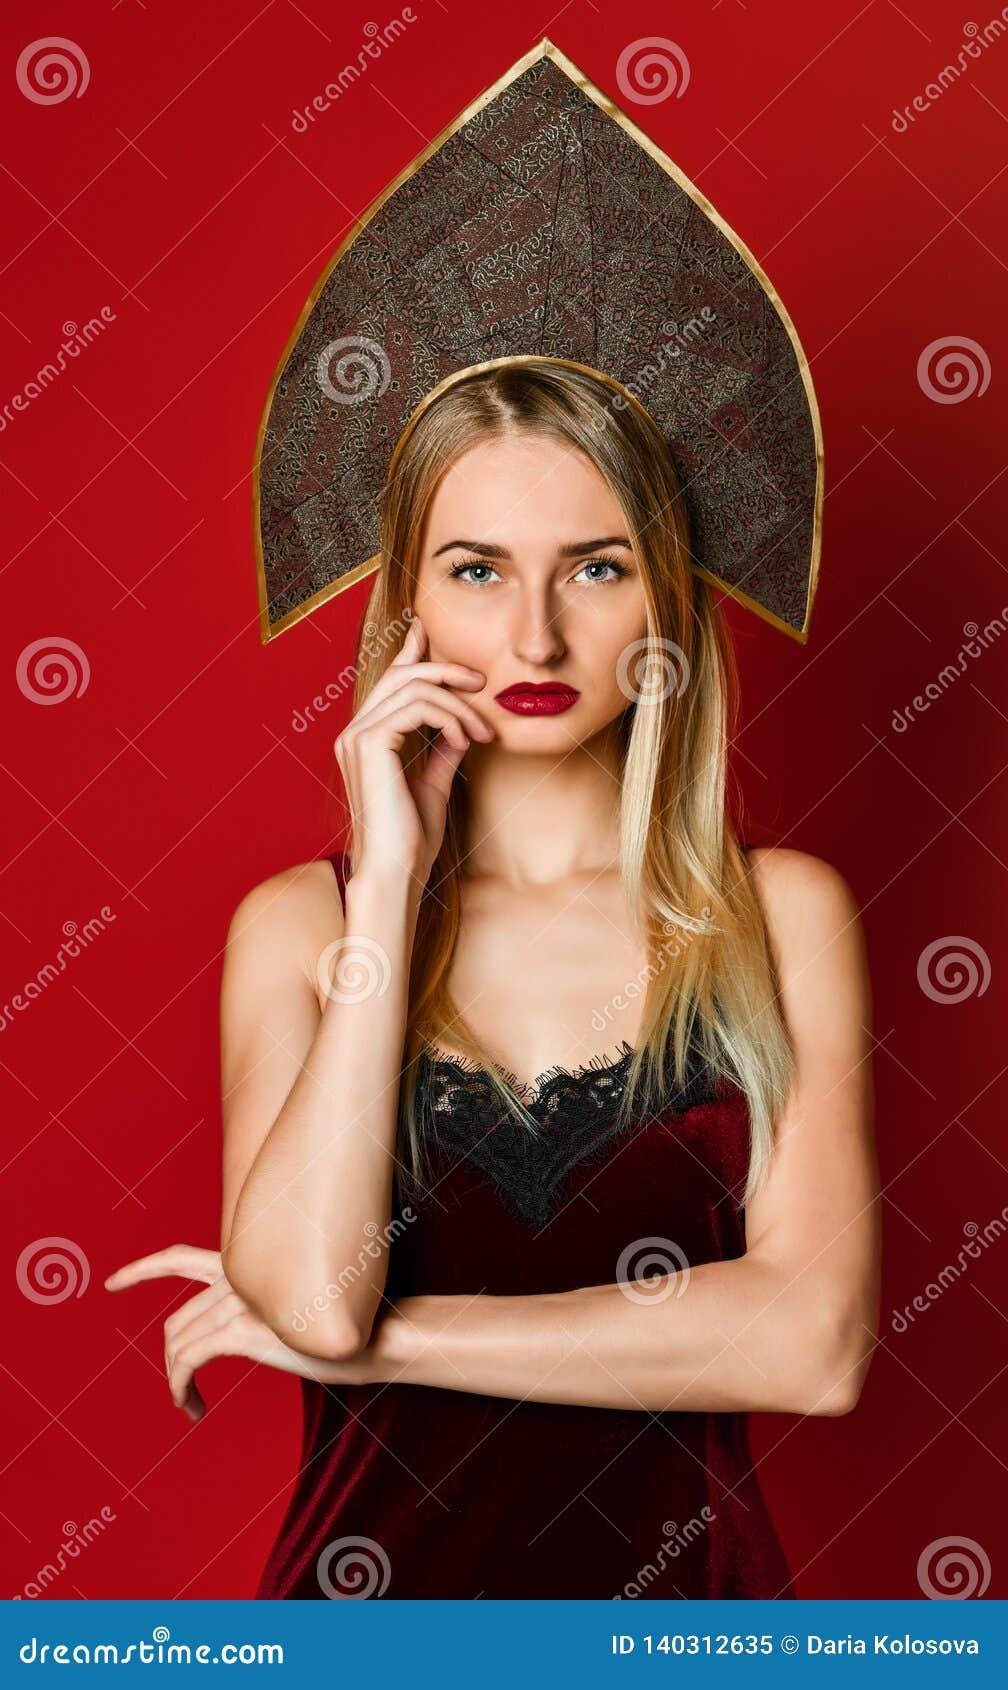 Mooi sexy blonde Russisch meisje in traditionele kokoshnikhoed, fluweel feestelijke kleding op een rode achtergrond,